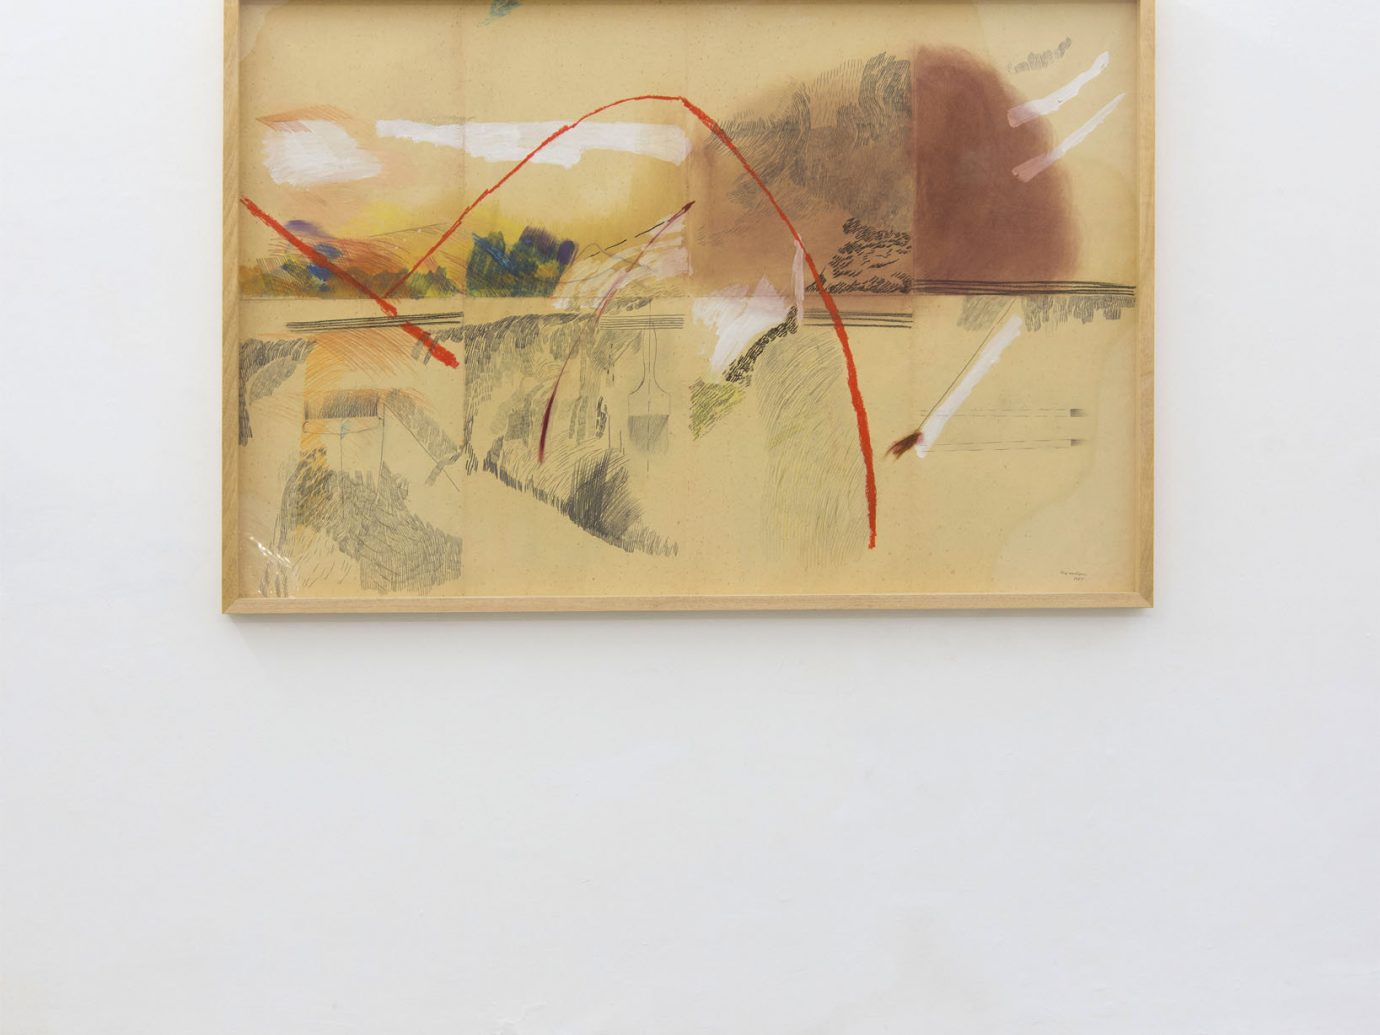 Arts + Culture modern art painting room art gallery product design picture frame artwork envelope